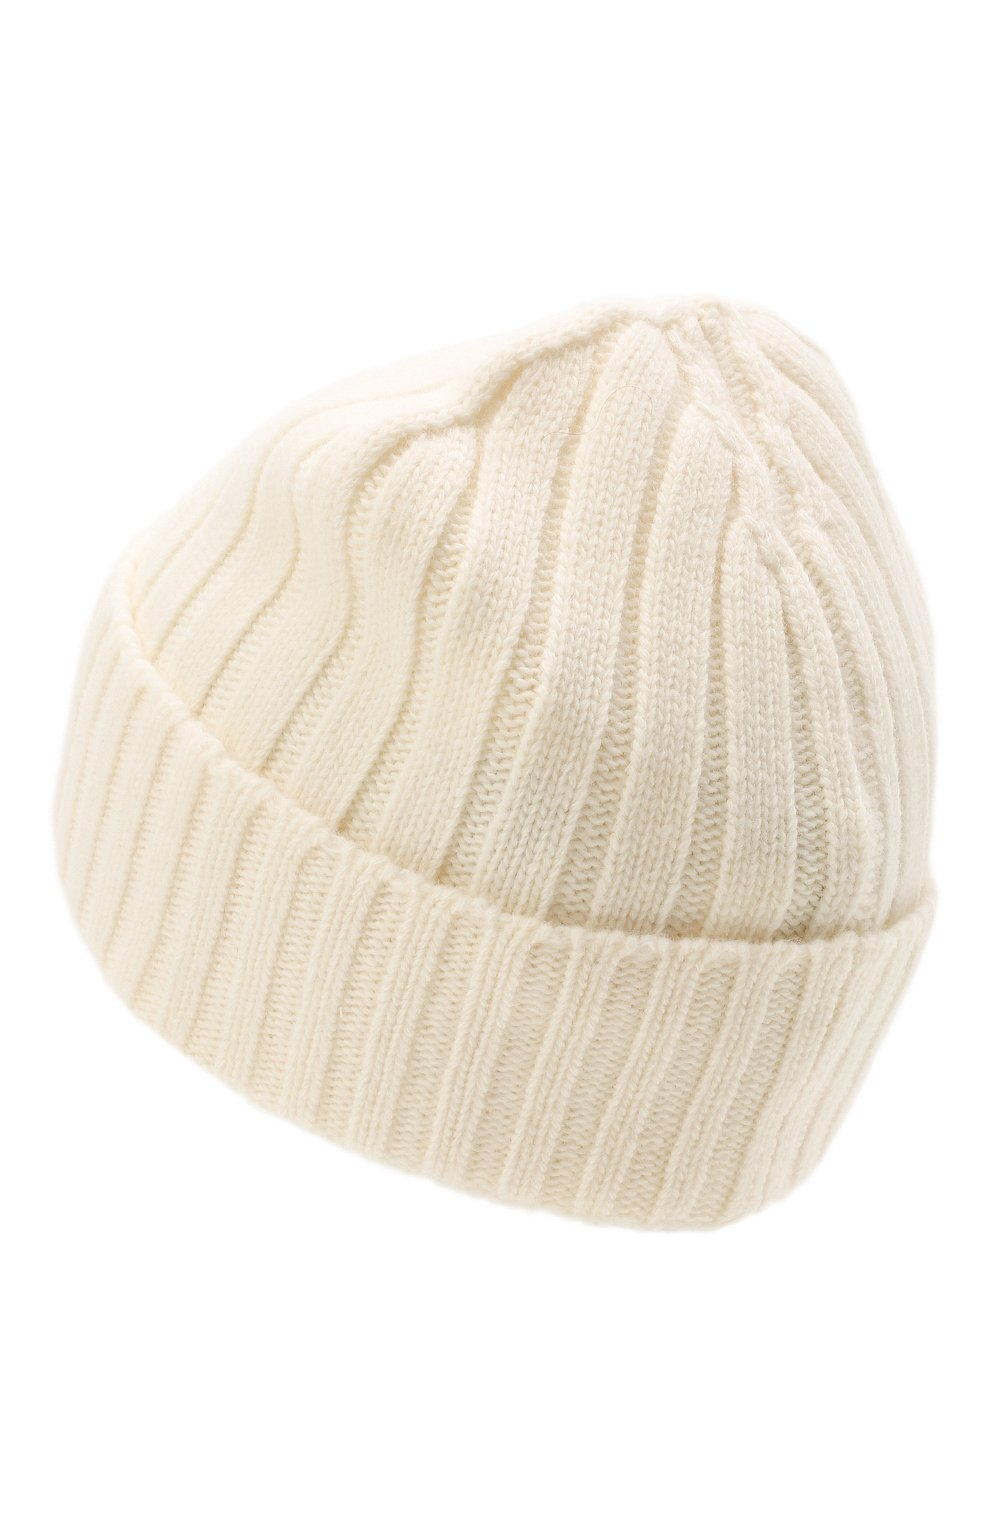 Мужская шерстяная шапка STONE ISLAND белого цвета, арт. 7515N24B5   Фото 2 (Материал: Шерсть; Кросс-КТ: Трикотаж)